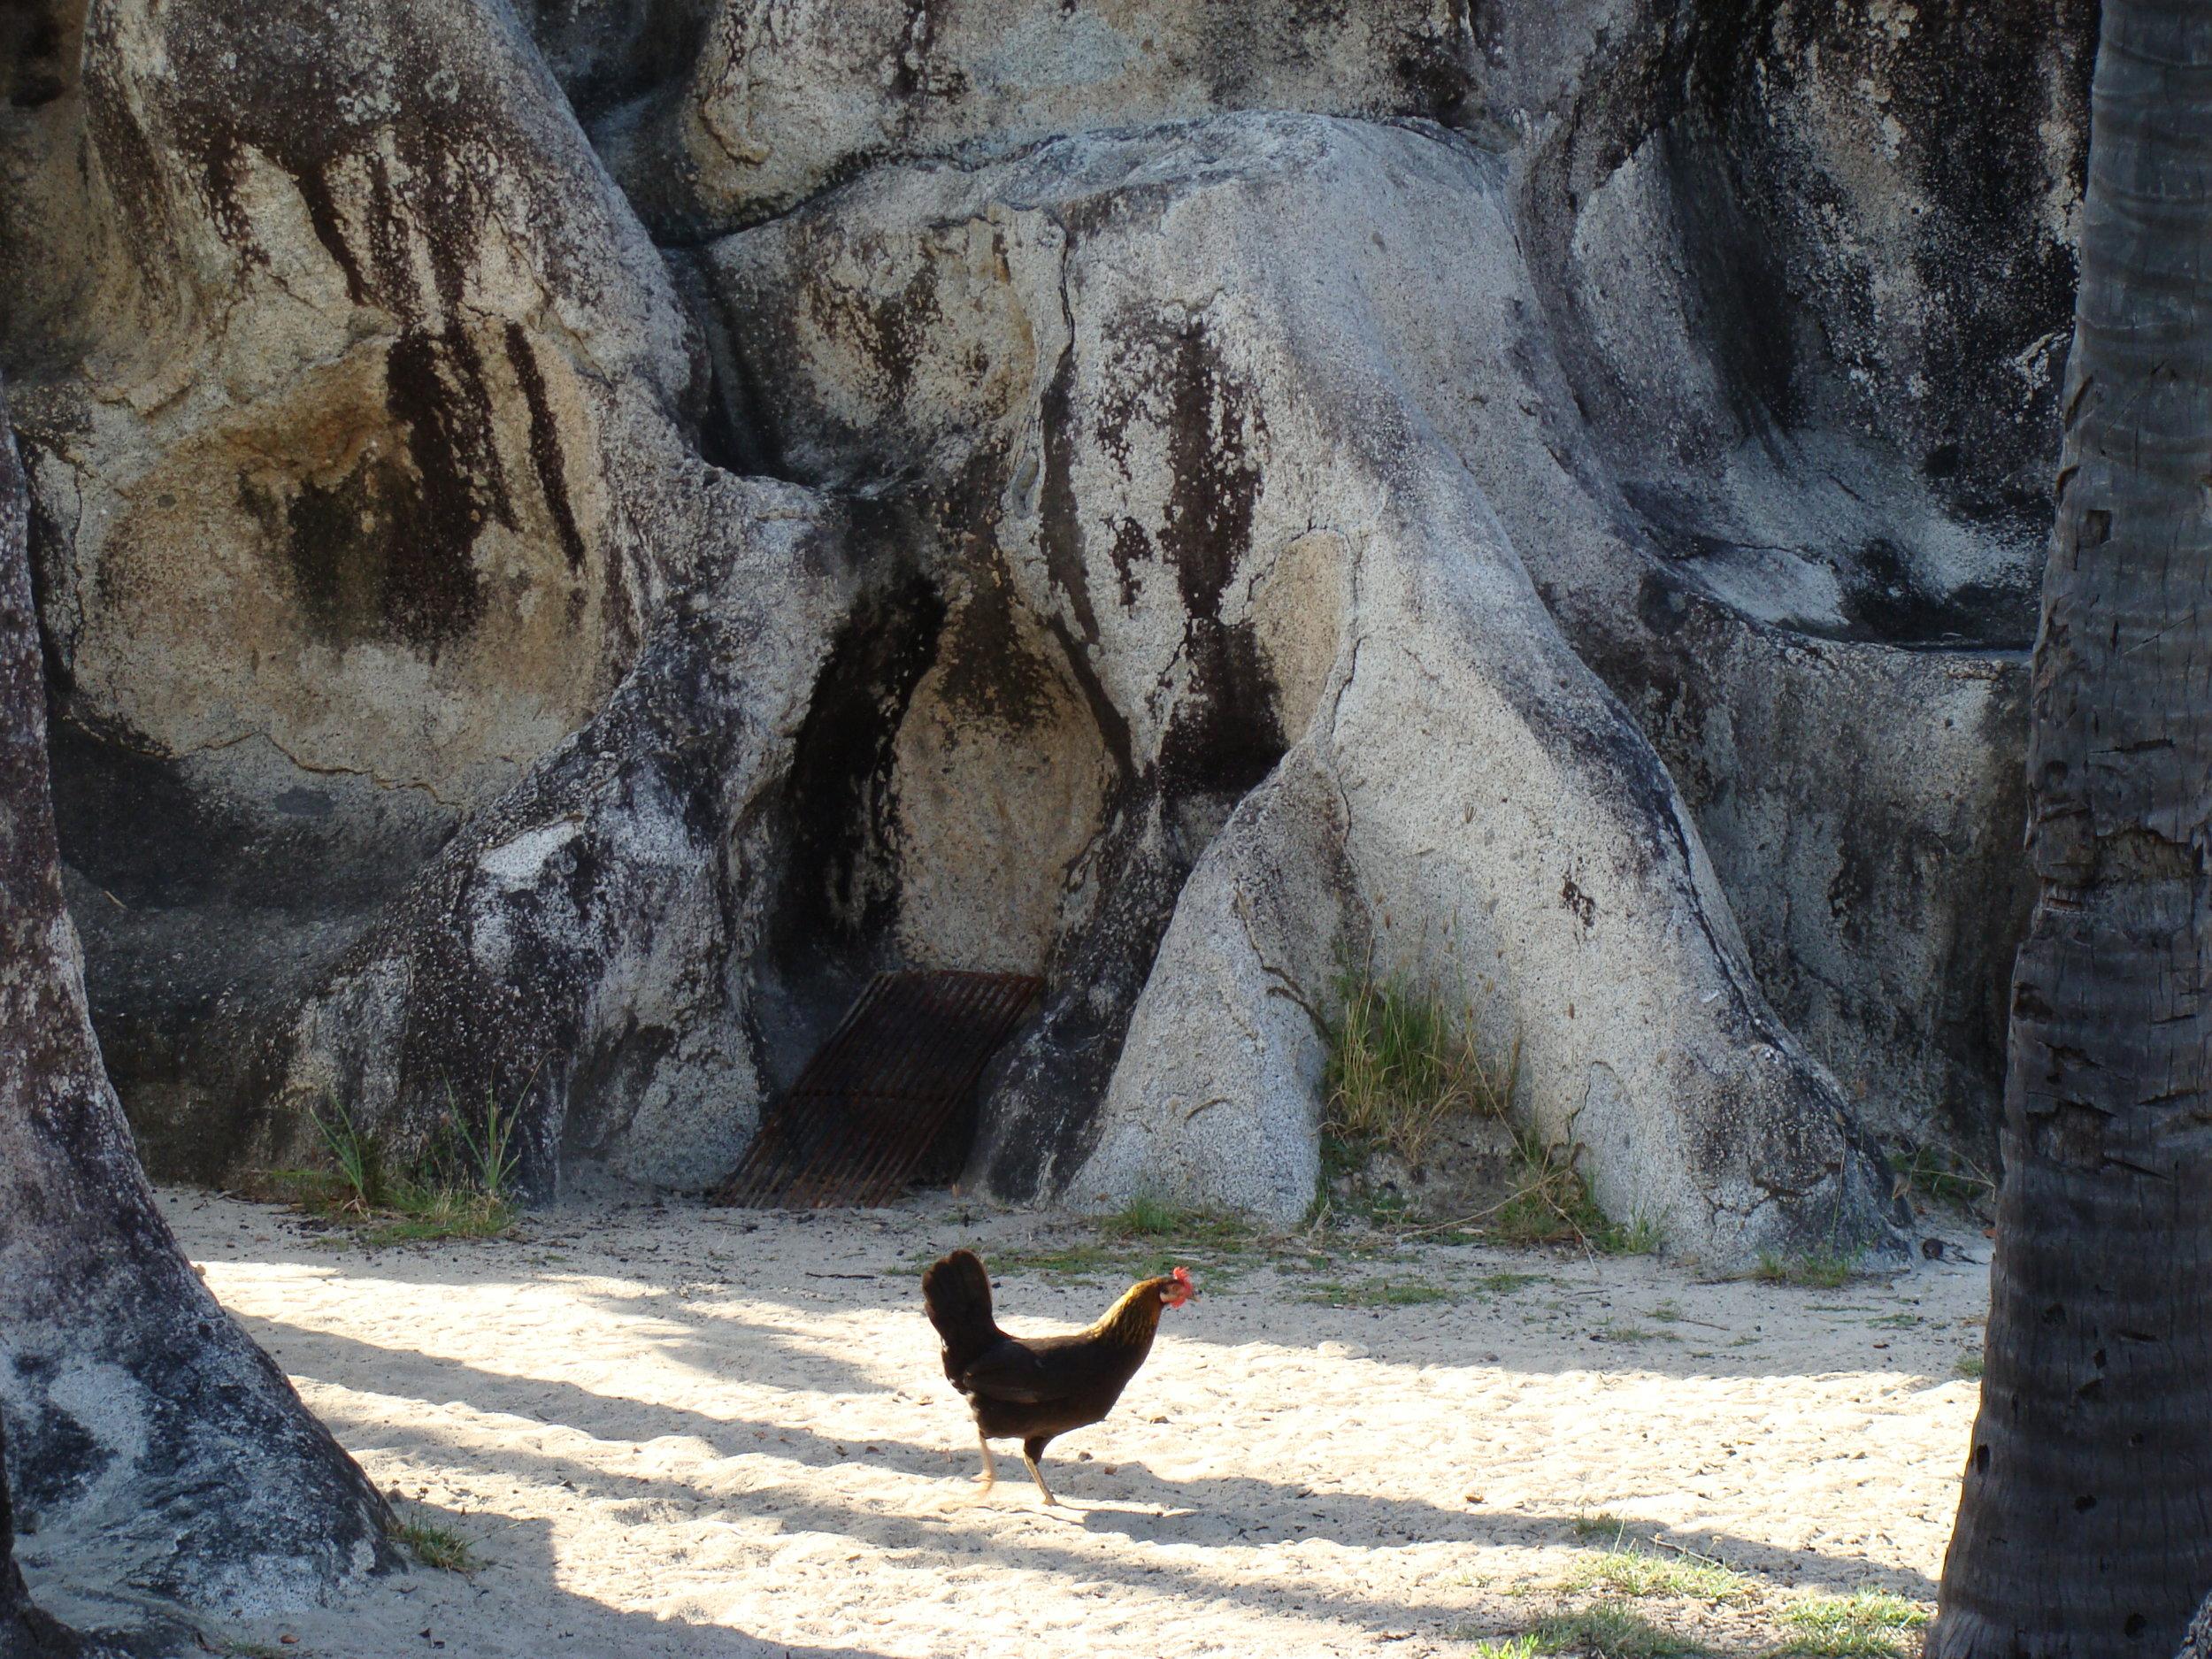 chicken_rocks.JPG